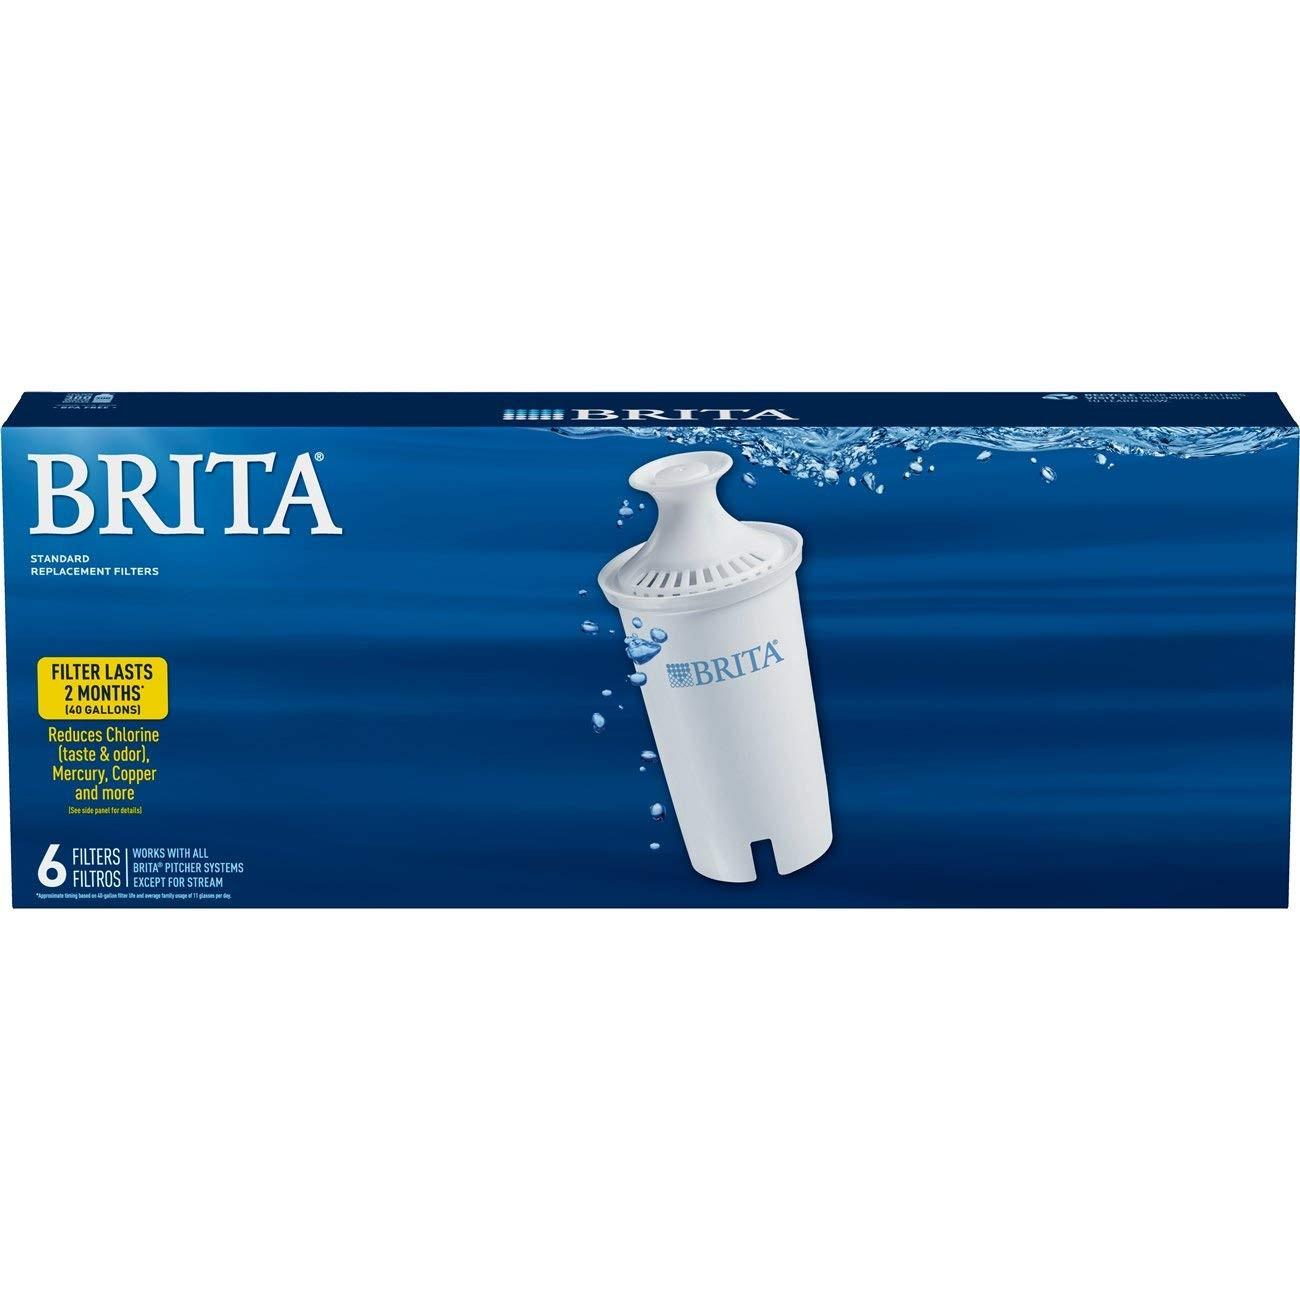 BRITA 碧然德  标准版 净水壶替换滤芯 6只装